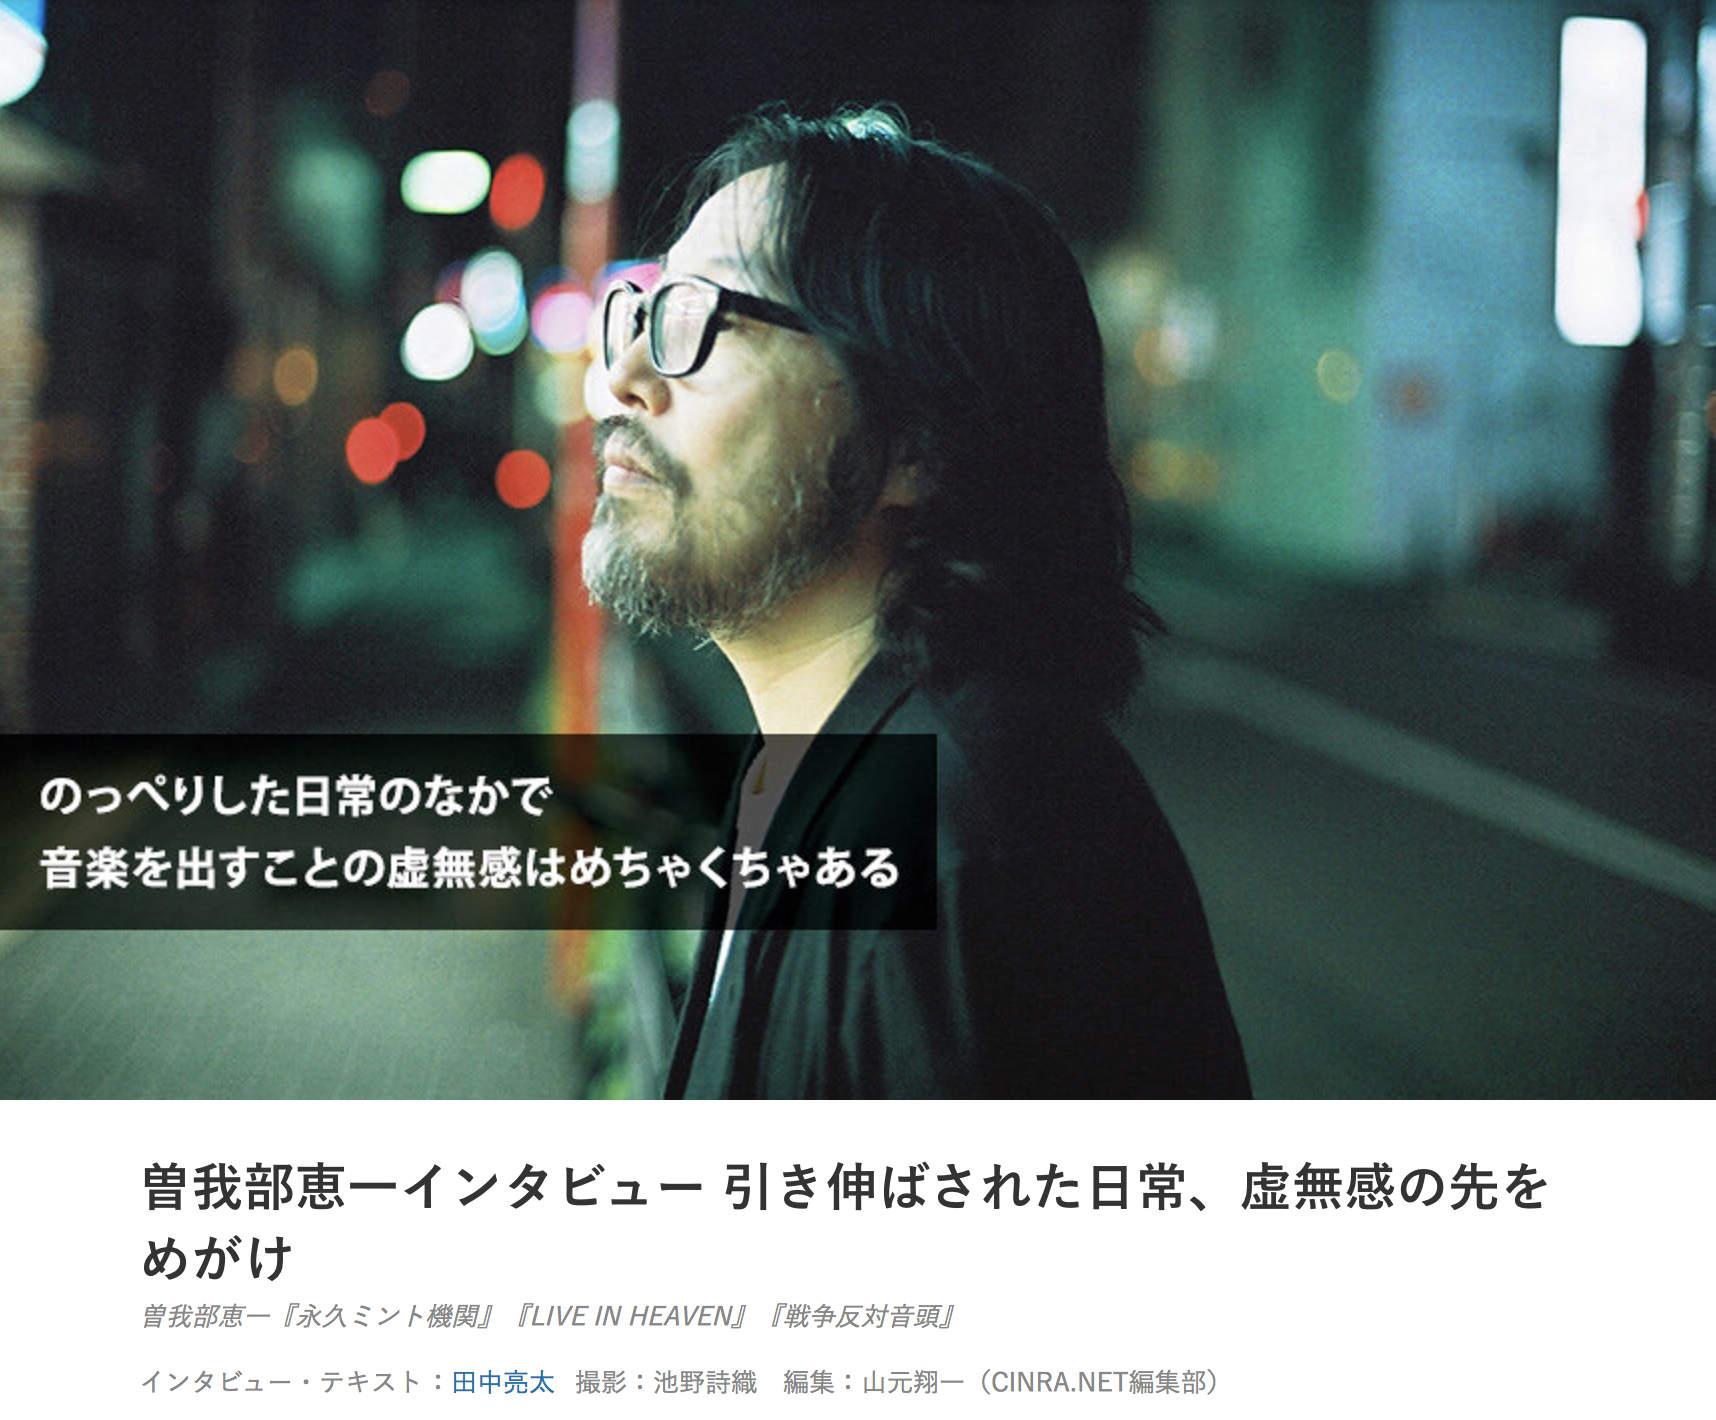 http://rose-records.jp/files/20201031102527.jpg